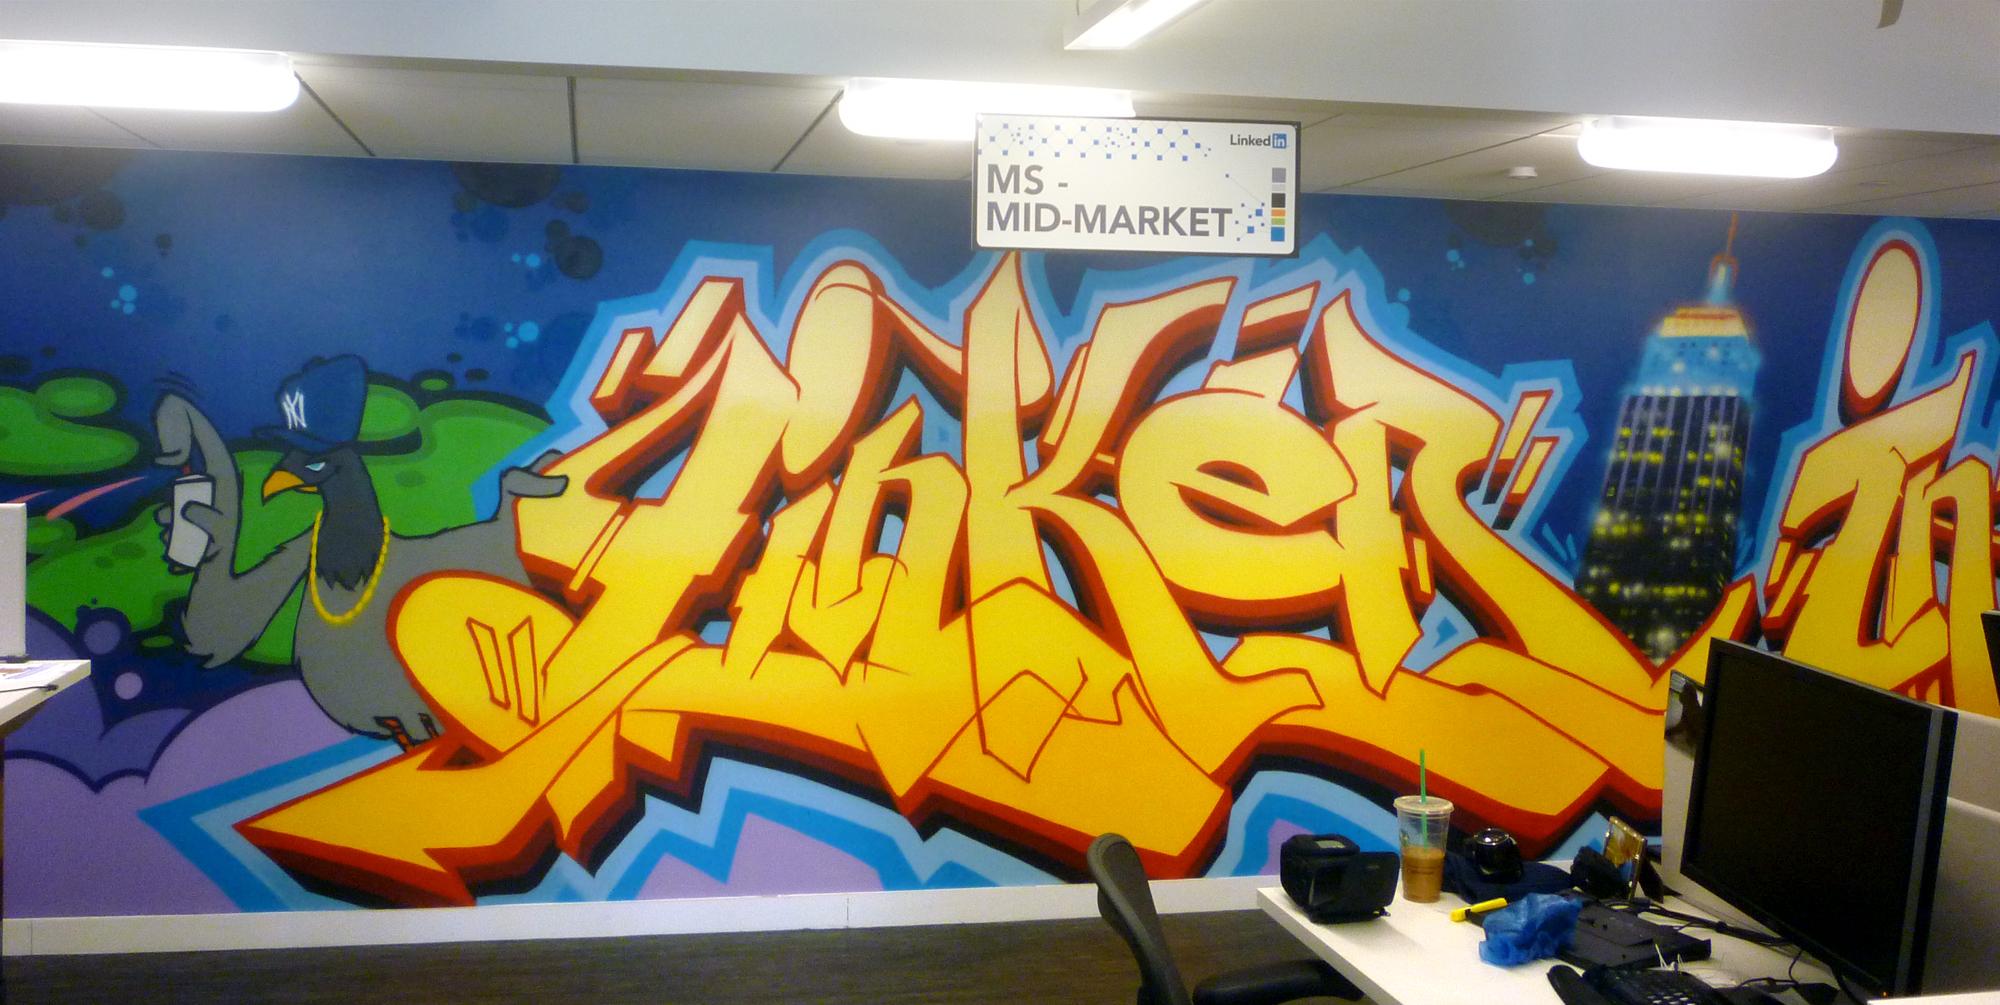 LinkedIn office graffiti mural graffiti artist for hire